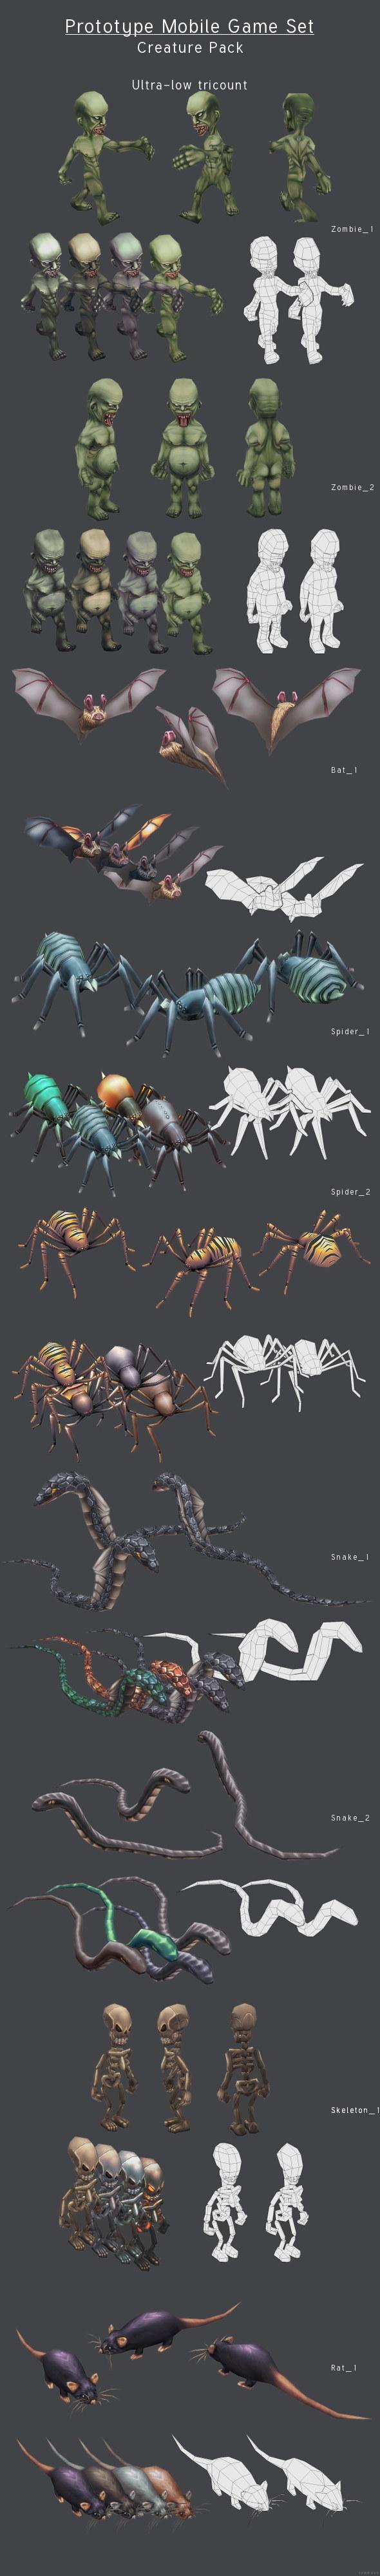 3DOcean Prototype Mobile Game Set Creature Pack 4307552